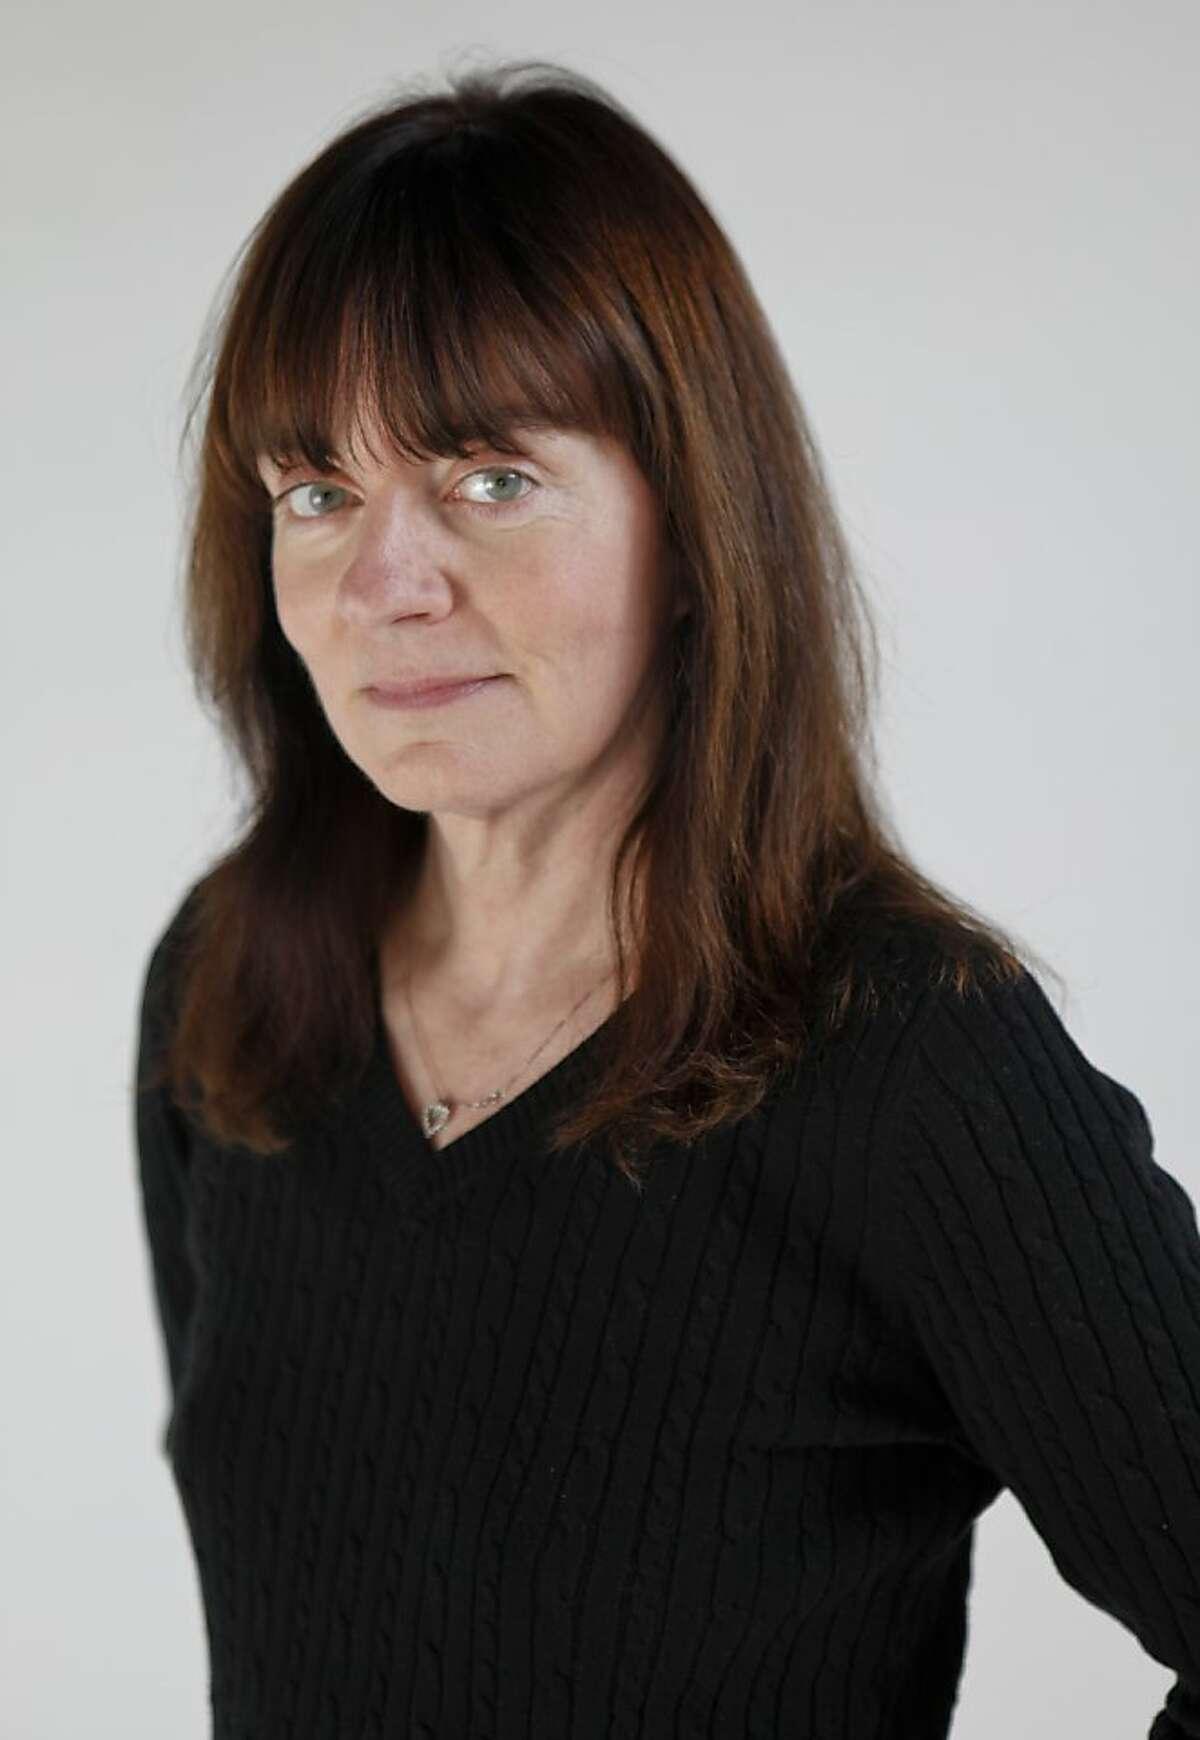 Sunday Datebook editor Sue Adolphson is seen on Wednesday, Feb. 2, 2011 in San Francisco, Calif.